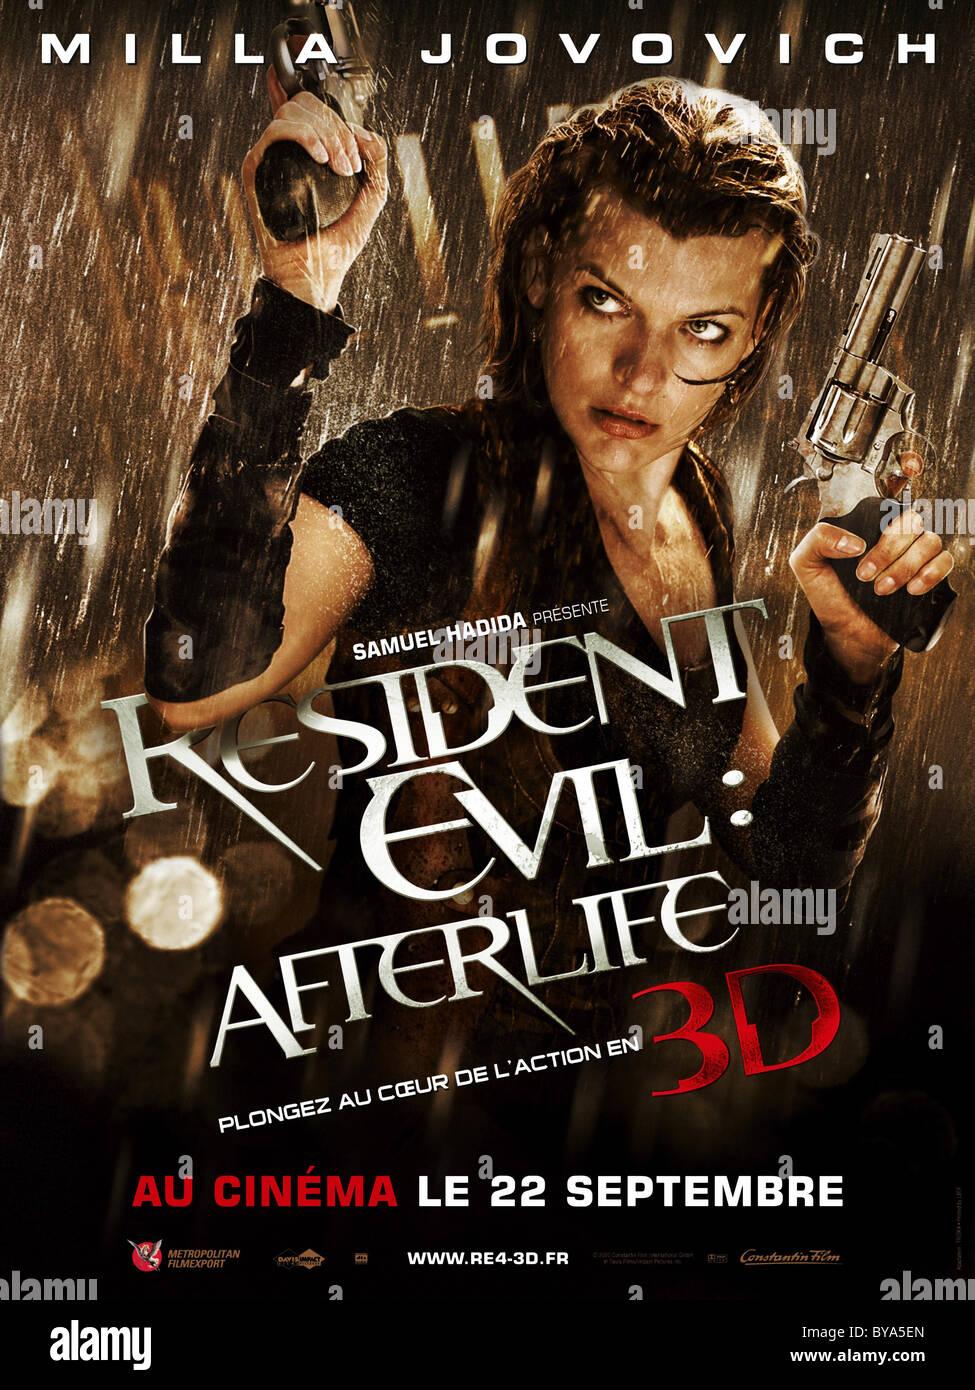 Resident Evil: Afterlife Jahr: 2010 USA / UK Regie: Paul w.s. Anderson Milla Jovovich Filmplakat (Fr) Stockbild